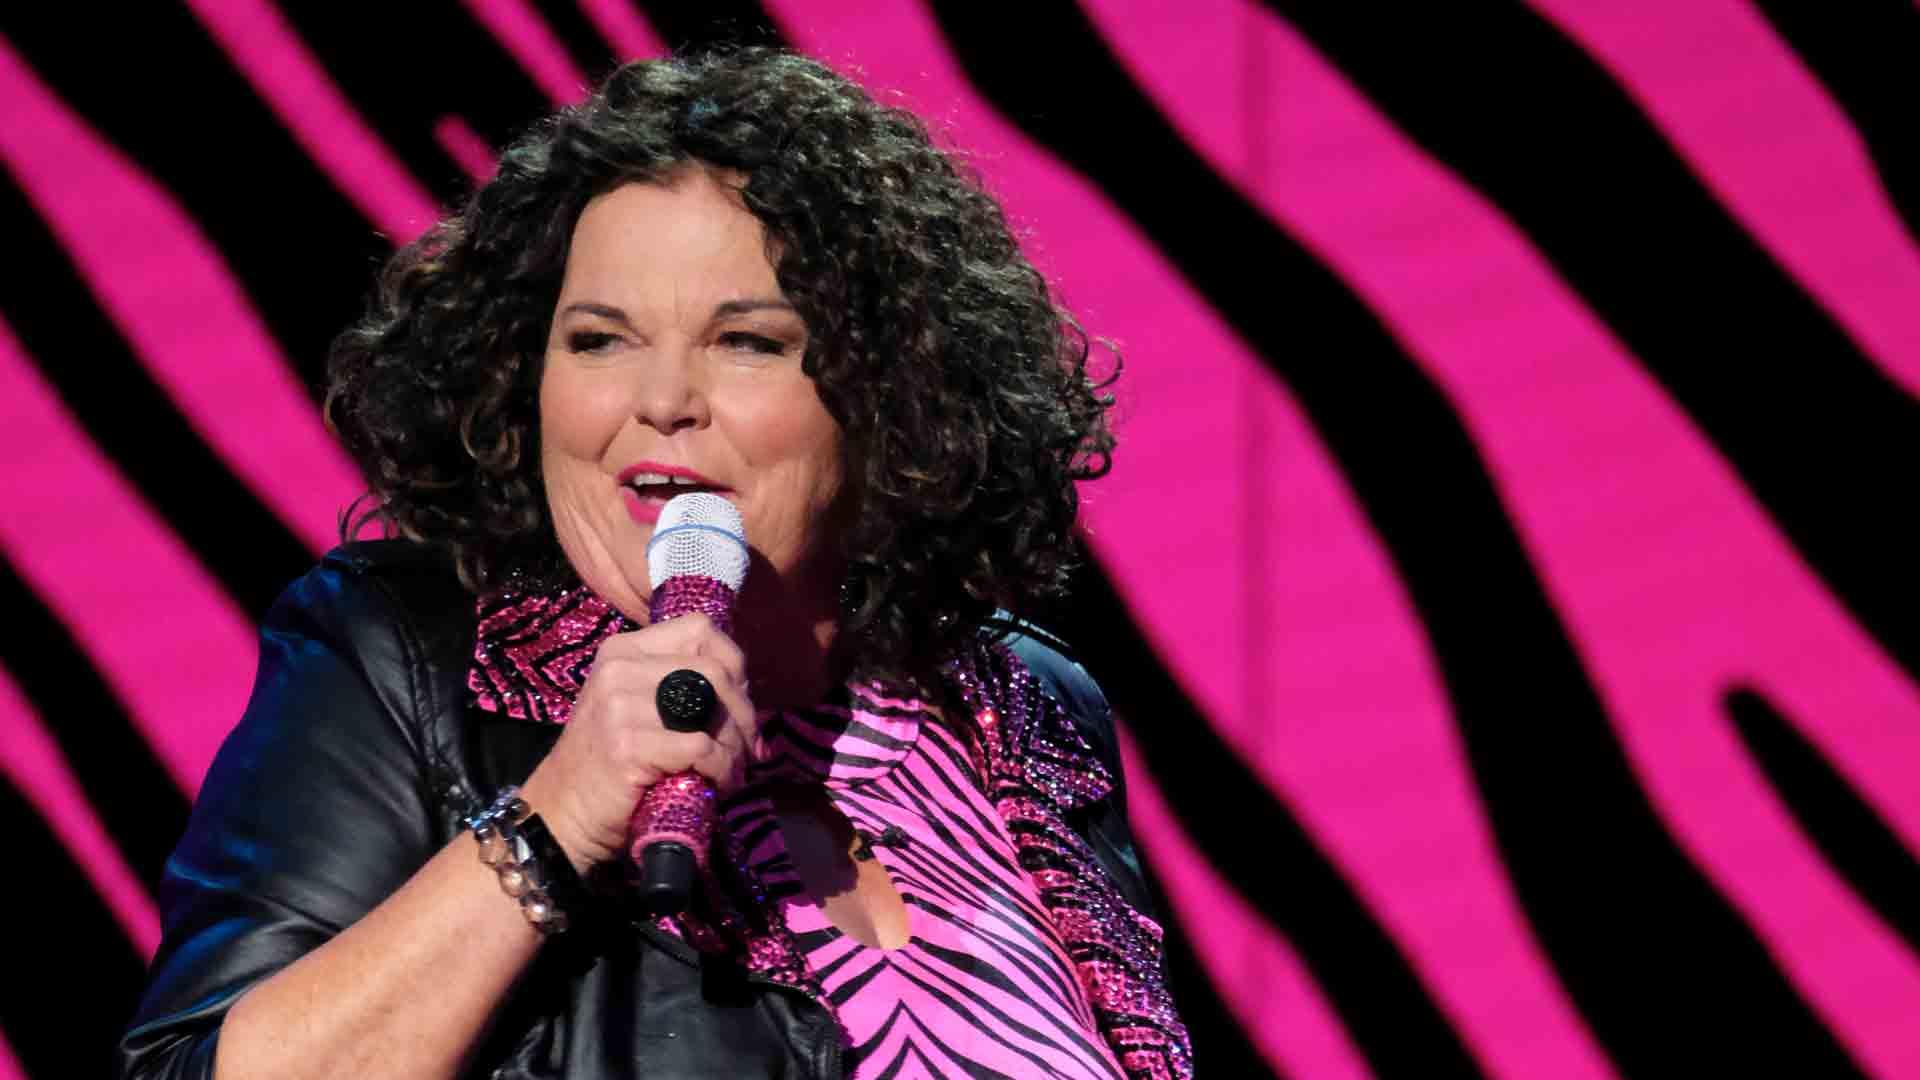 Watch Americas Got Talent Highlight: Vicki Barbolak